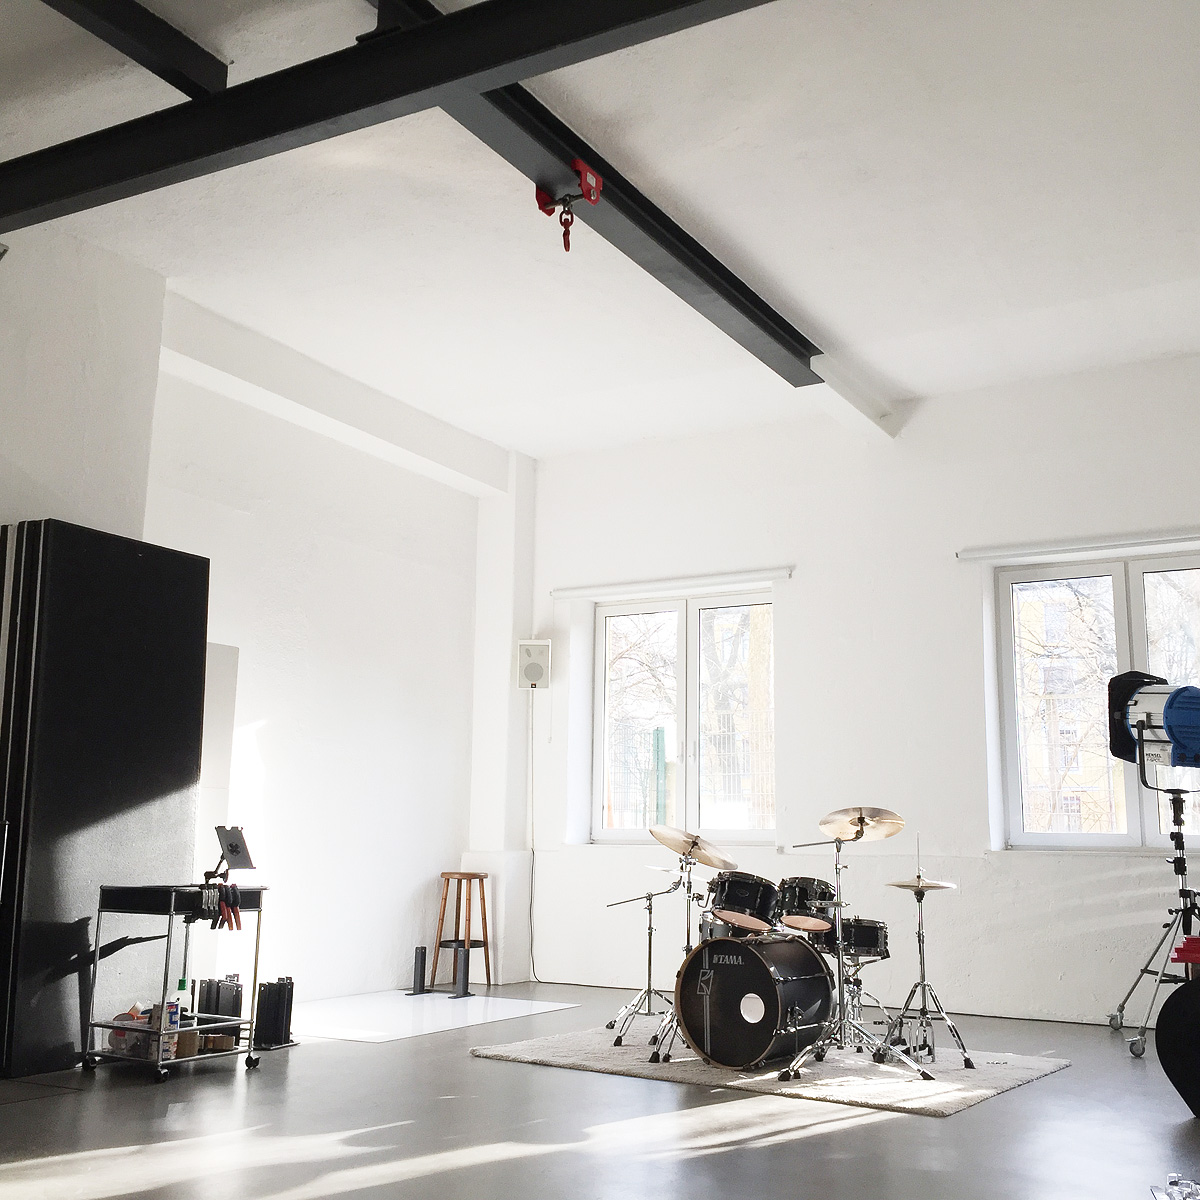 loft with drum set